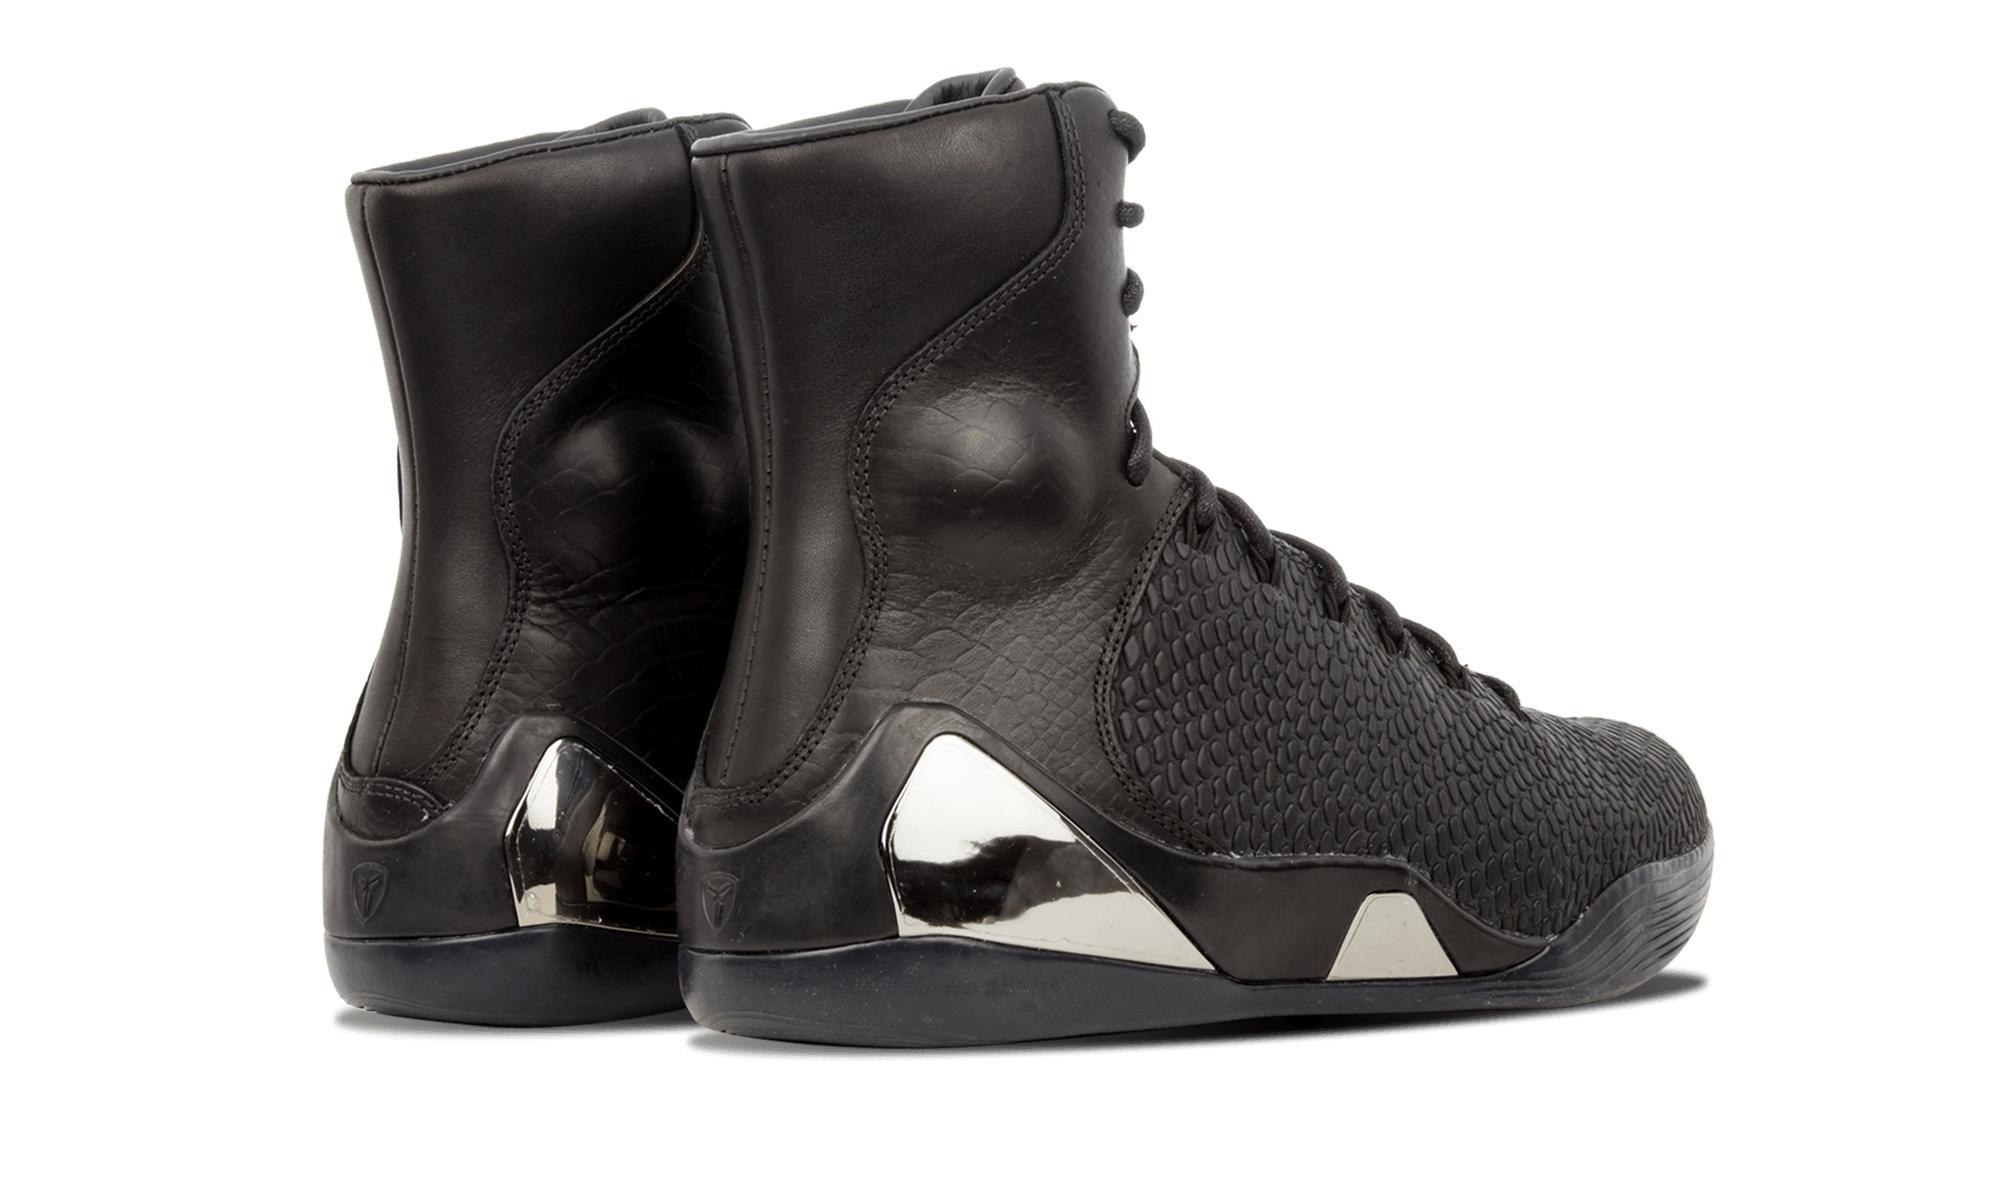 58f094c47ec0 Nike Kobe 9 High Krm Ext Qs in Black for Men - Save 9% - Lyst